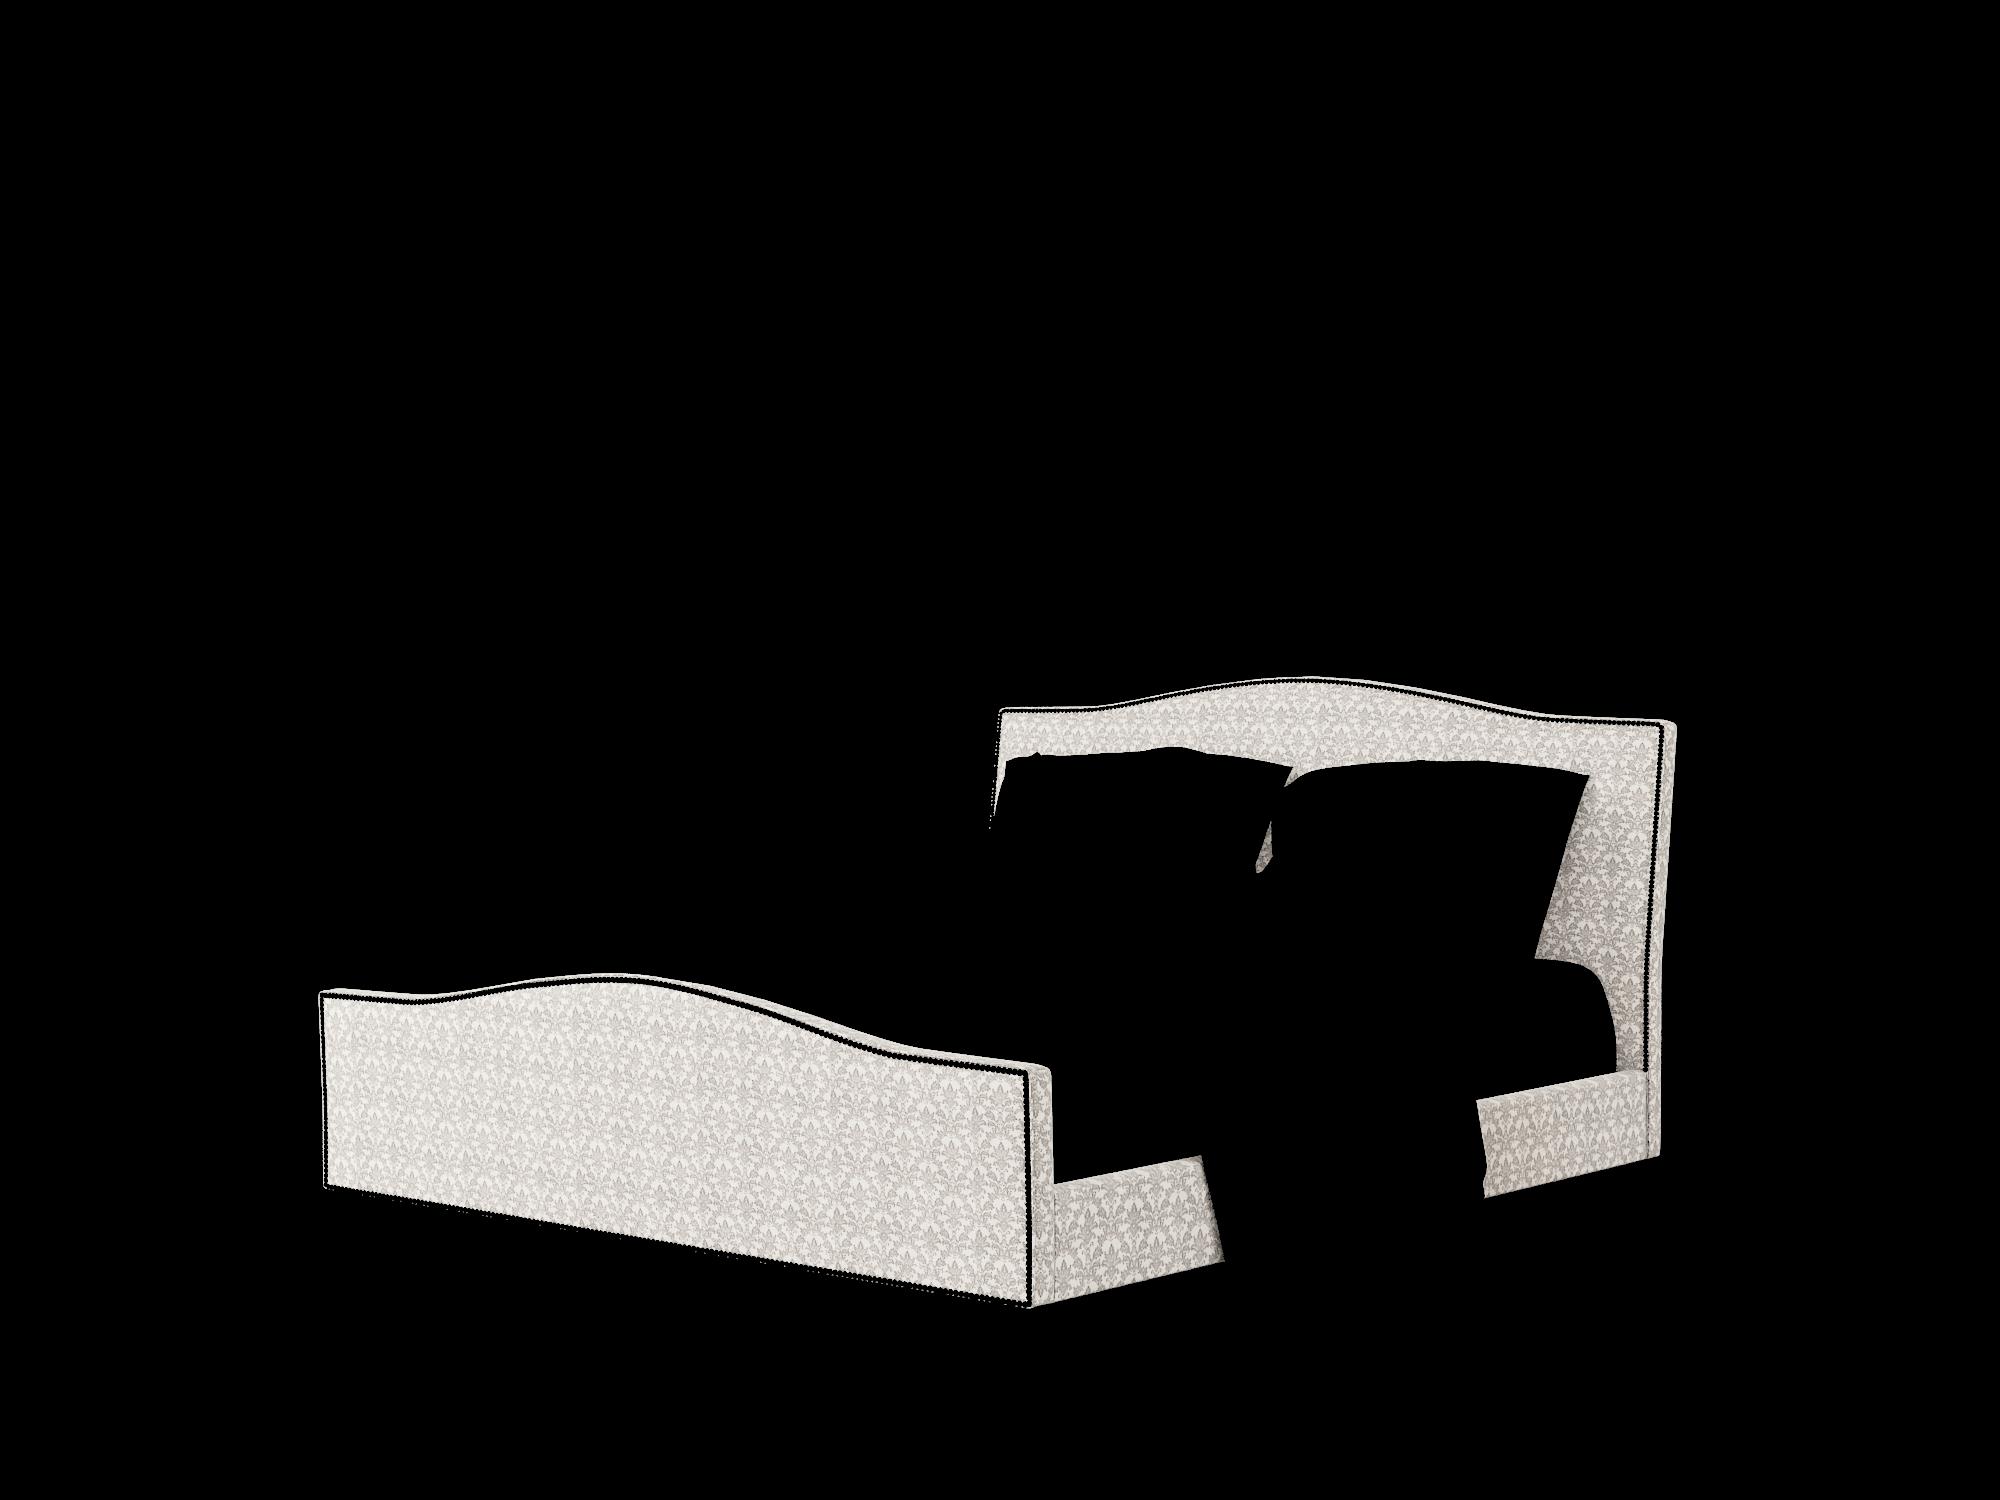 Prato Bergamo Dove Bed King Room Texture